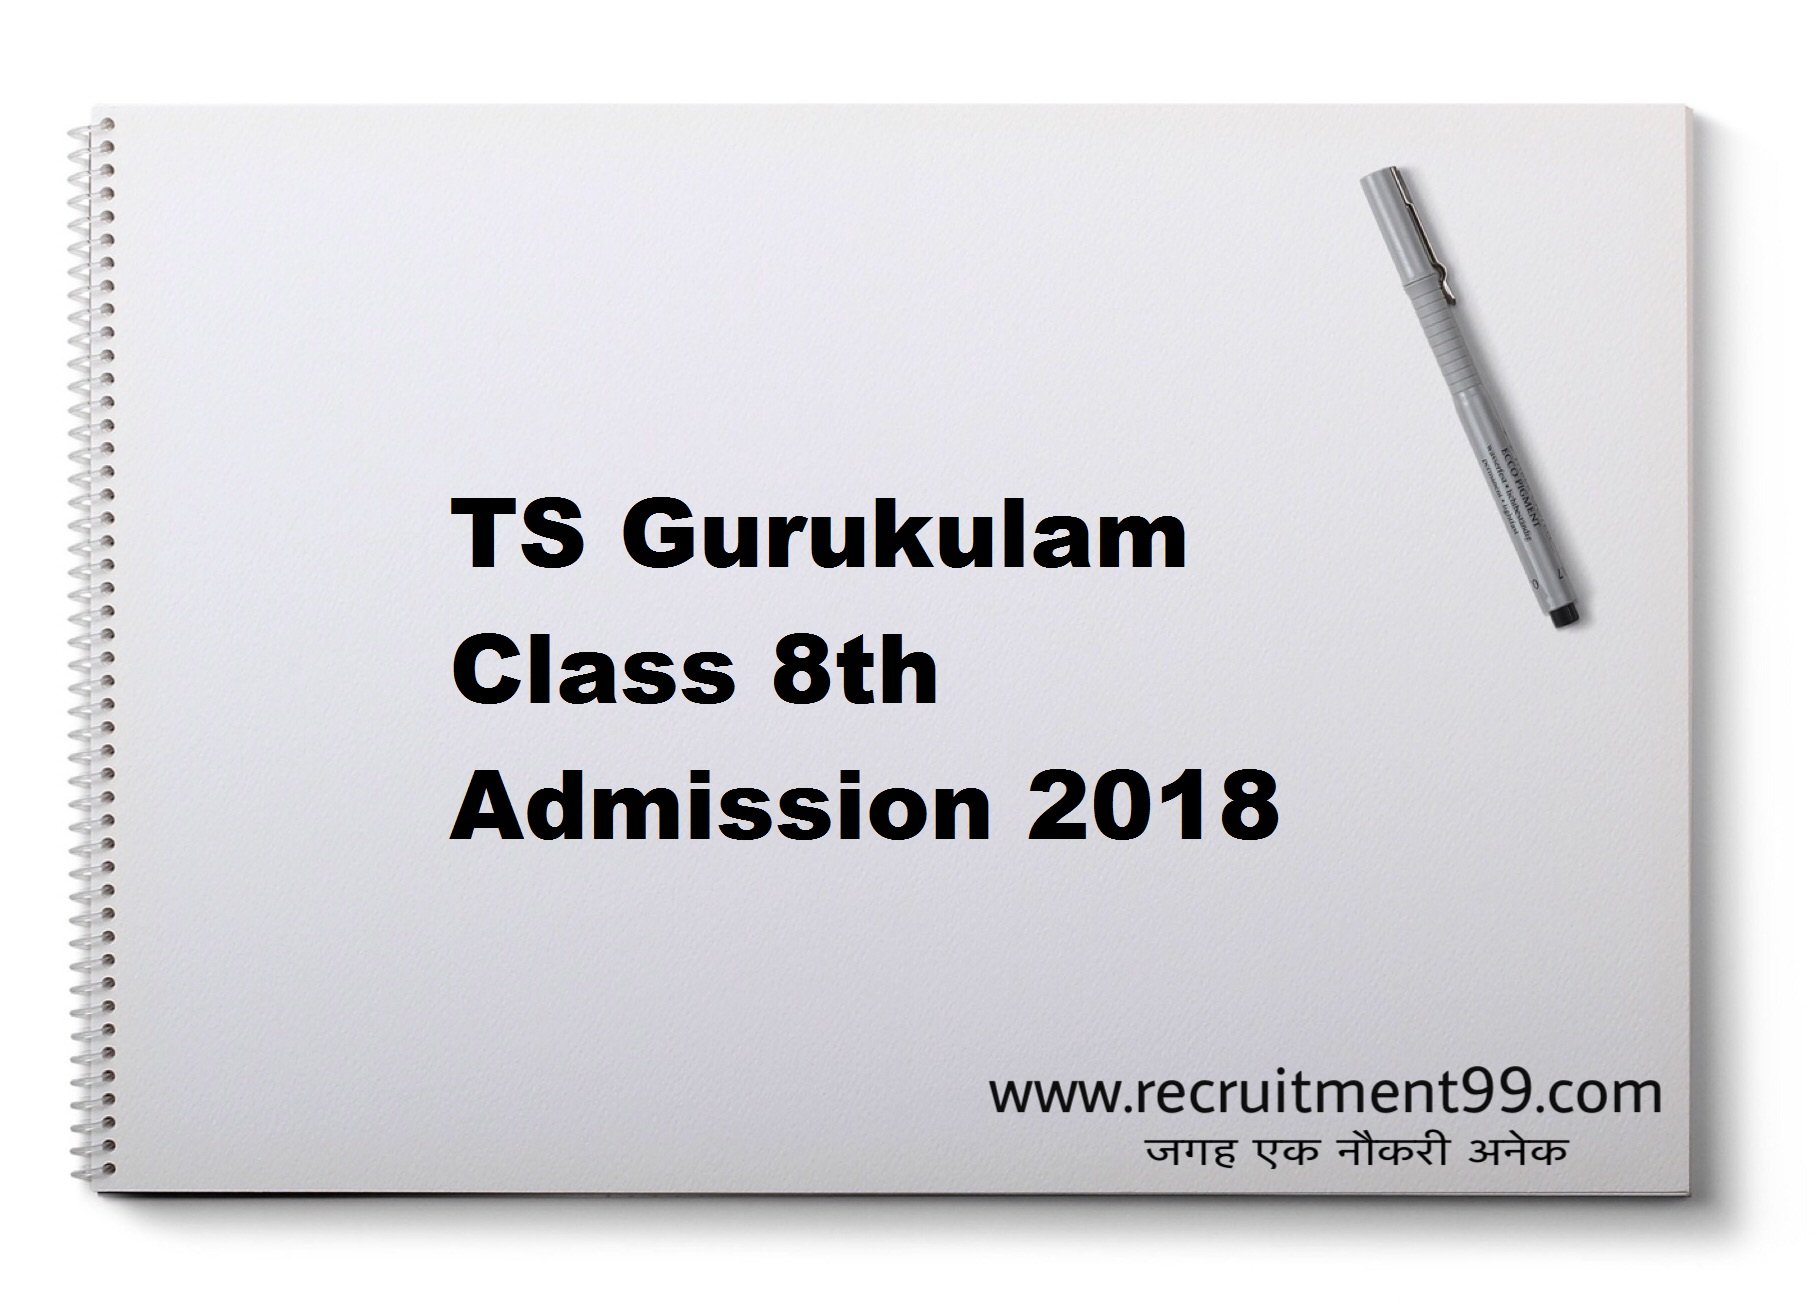 TS Gurukulam 8thClass Admission Hall Ticket Result 2018